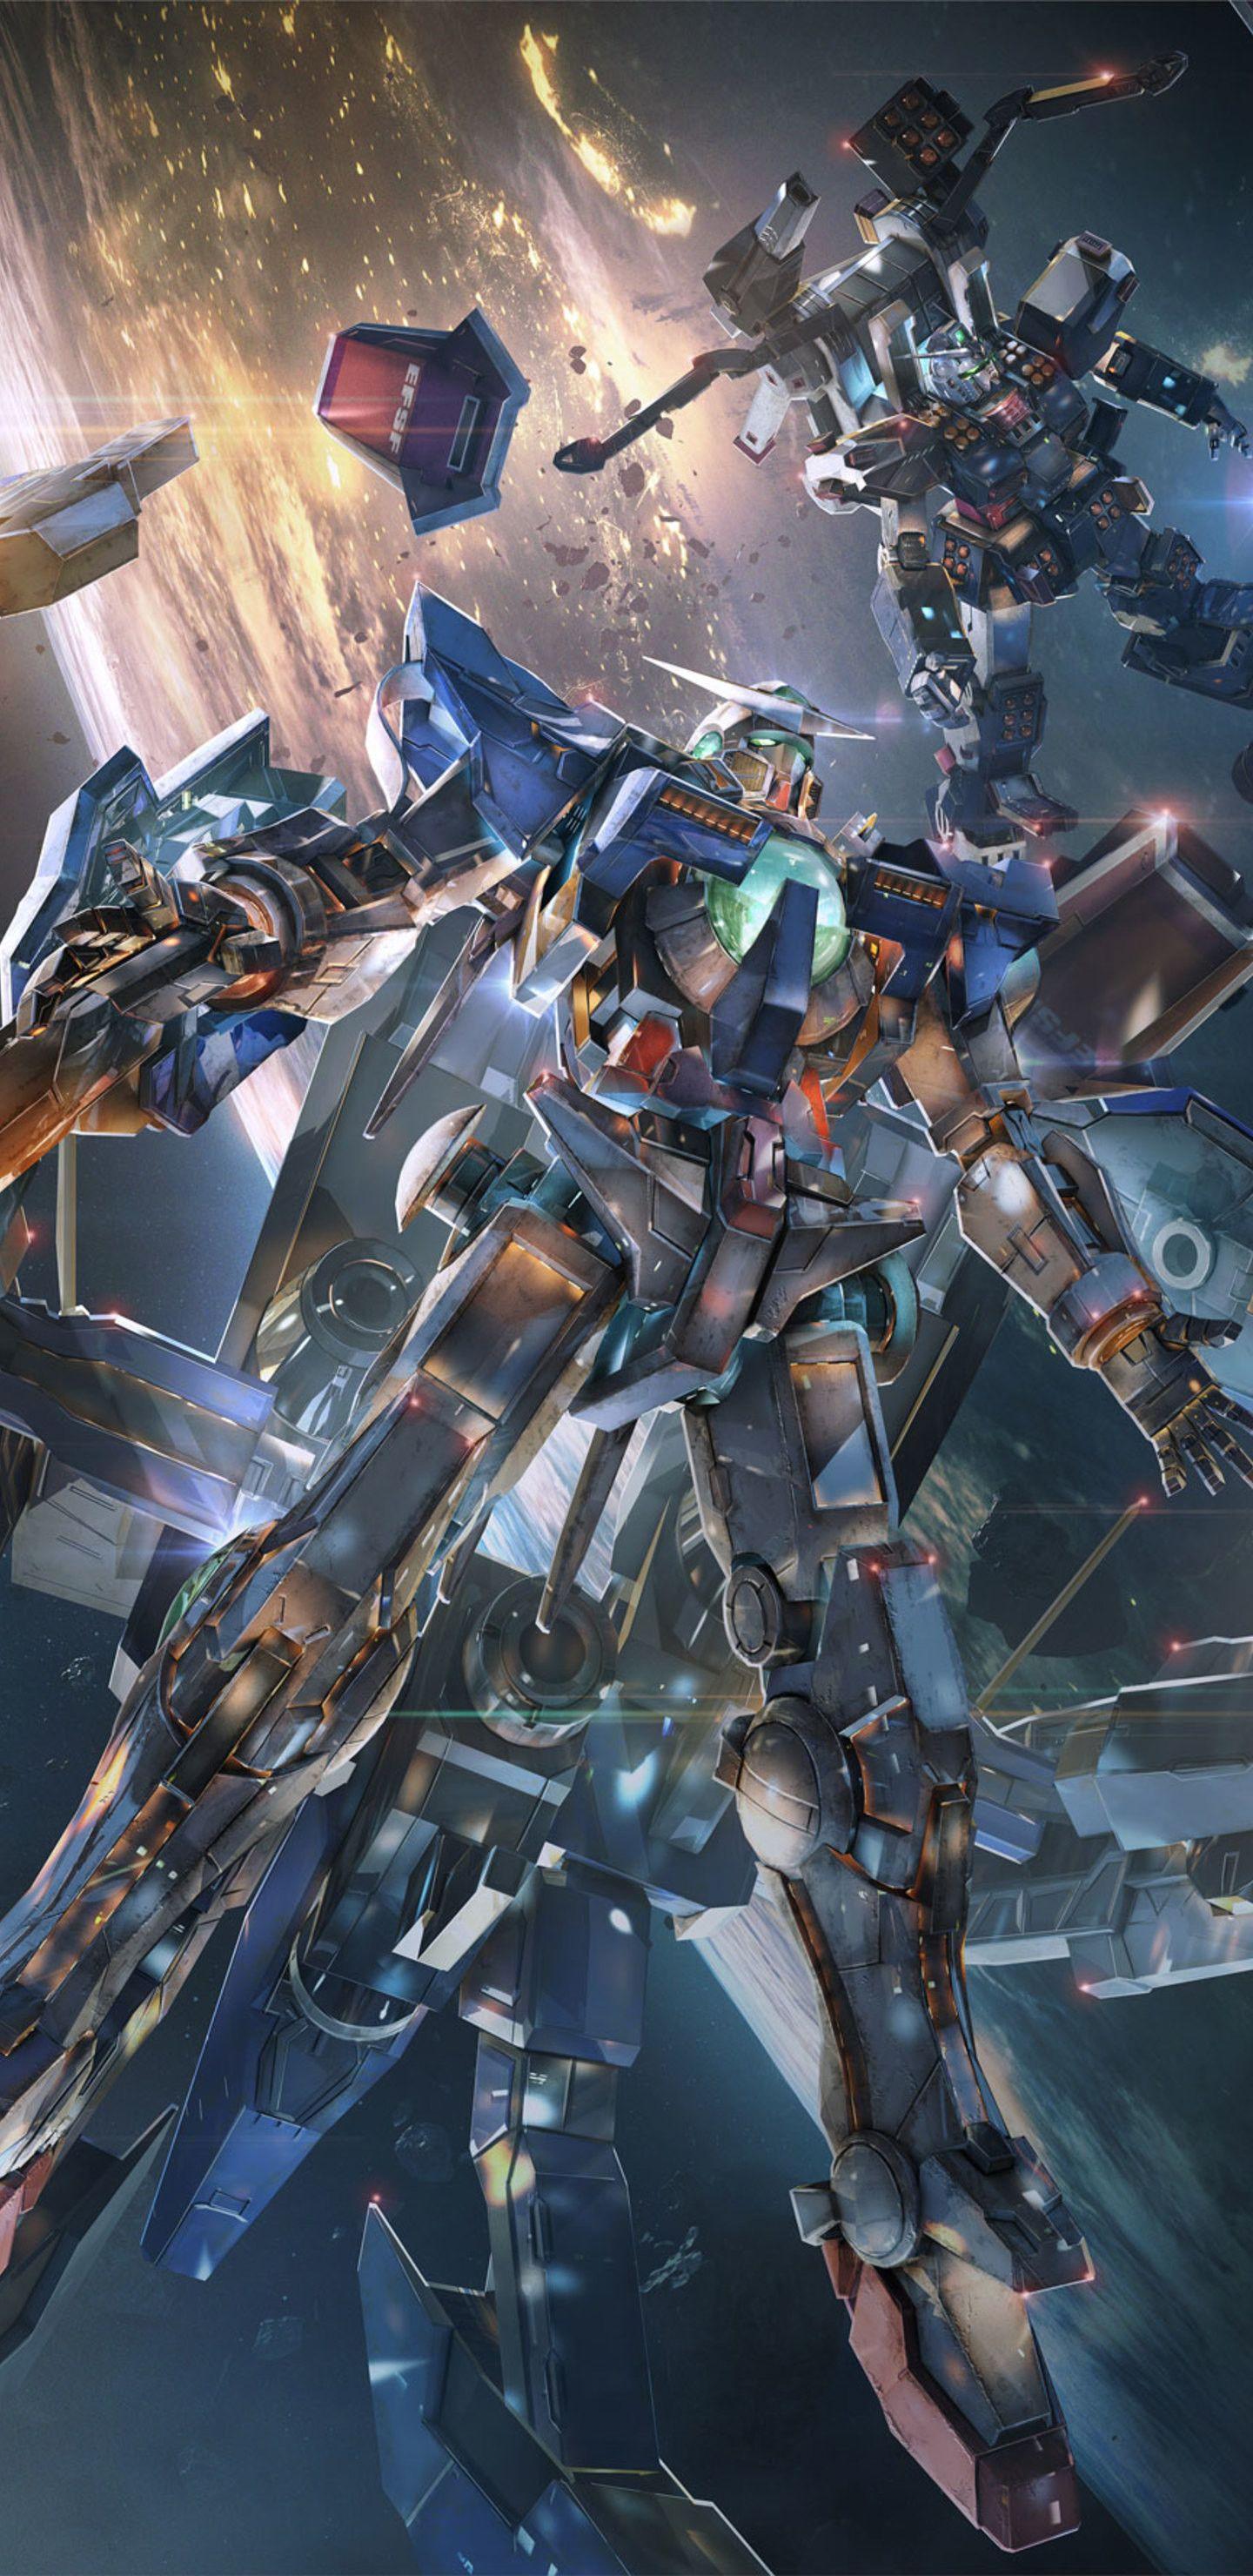 1440x2960 gundamversus4khd.jpg Gundam wallpapers